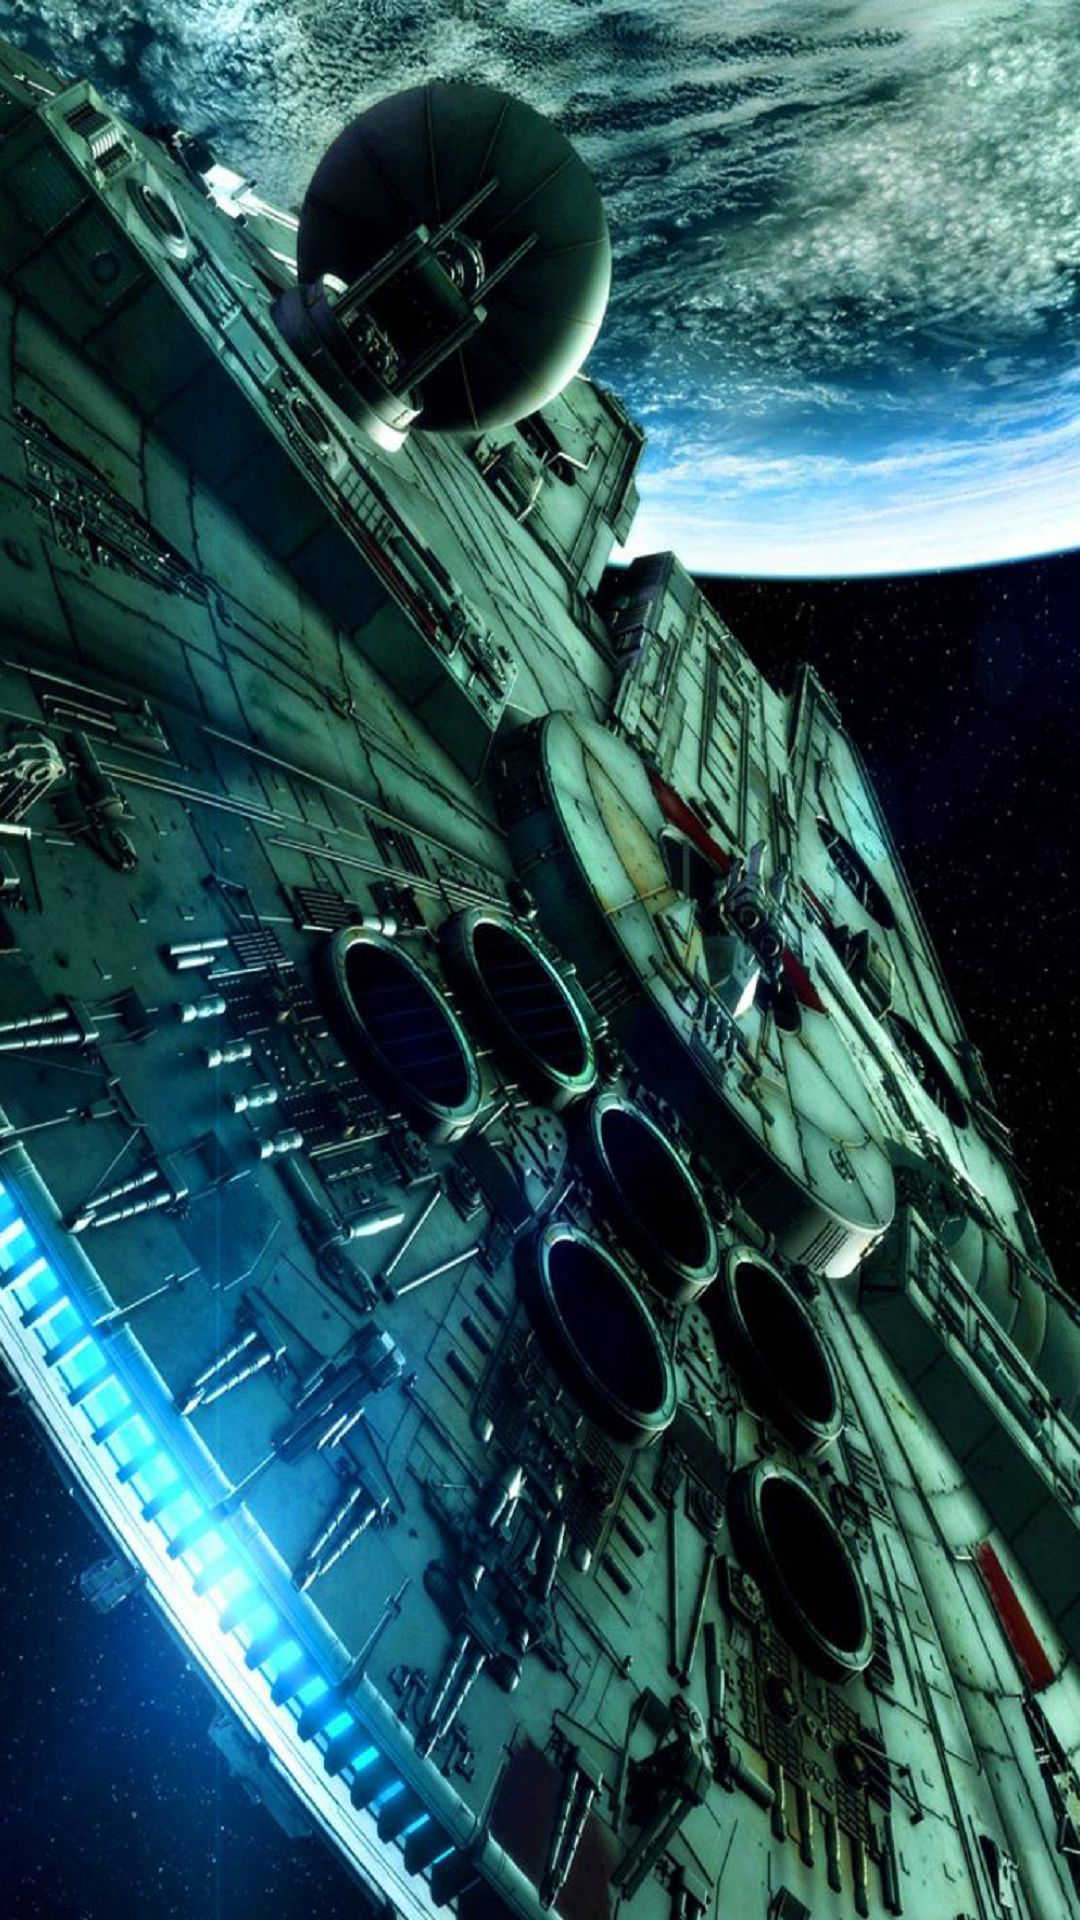 wallpaper hd iphone x, 8, 7, 6 - star wars spaceship - free download